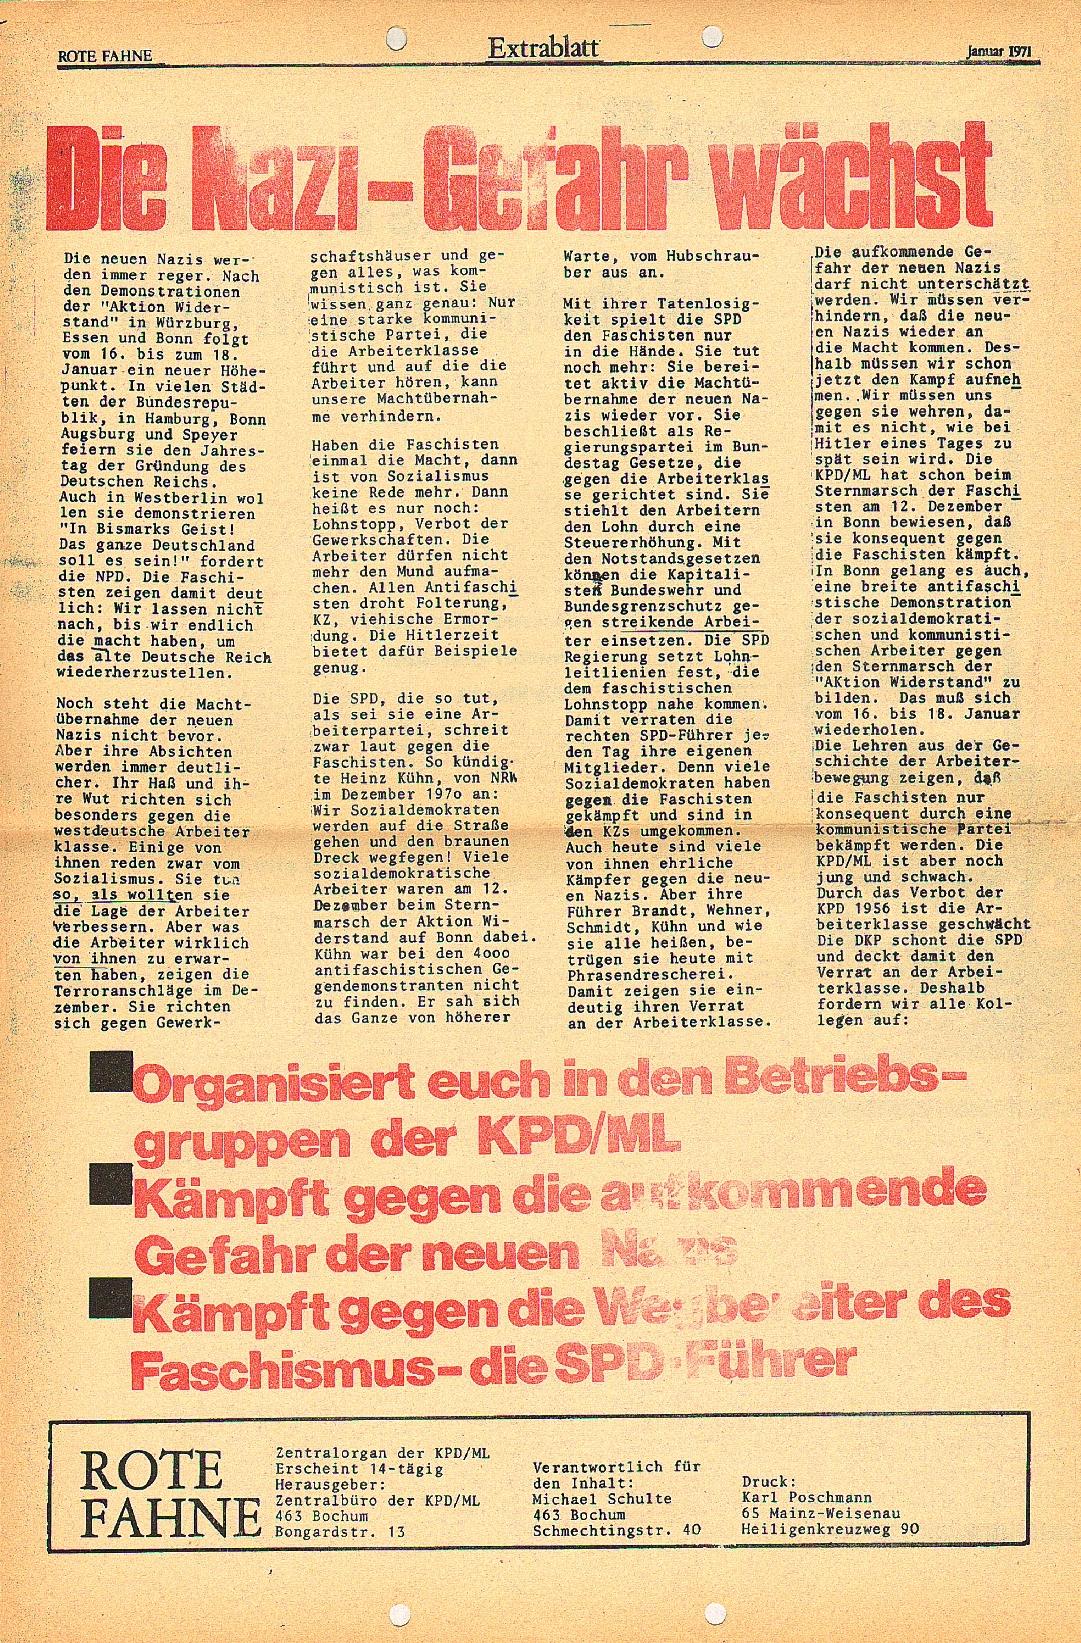 Rote Fahne, 2. Jg., Januar 1971, Extrablatt, Seite 4